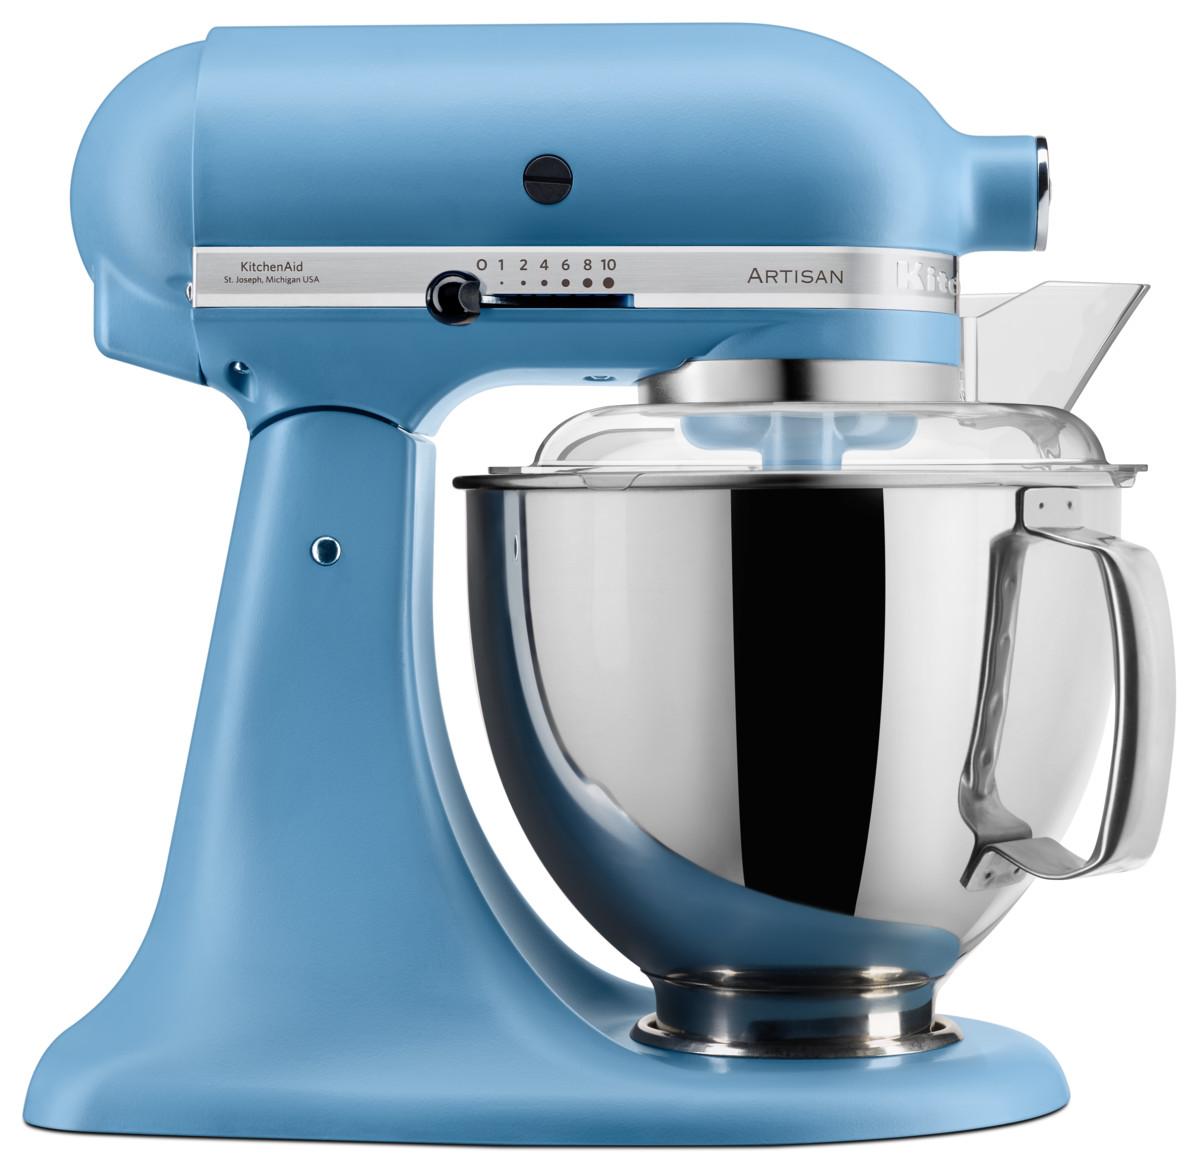 KITCHEN A 4.8L食物廚師機 5KSM175PSBVB 絲藍